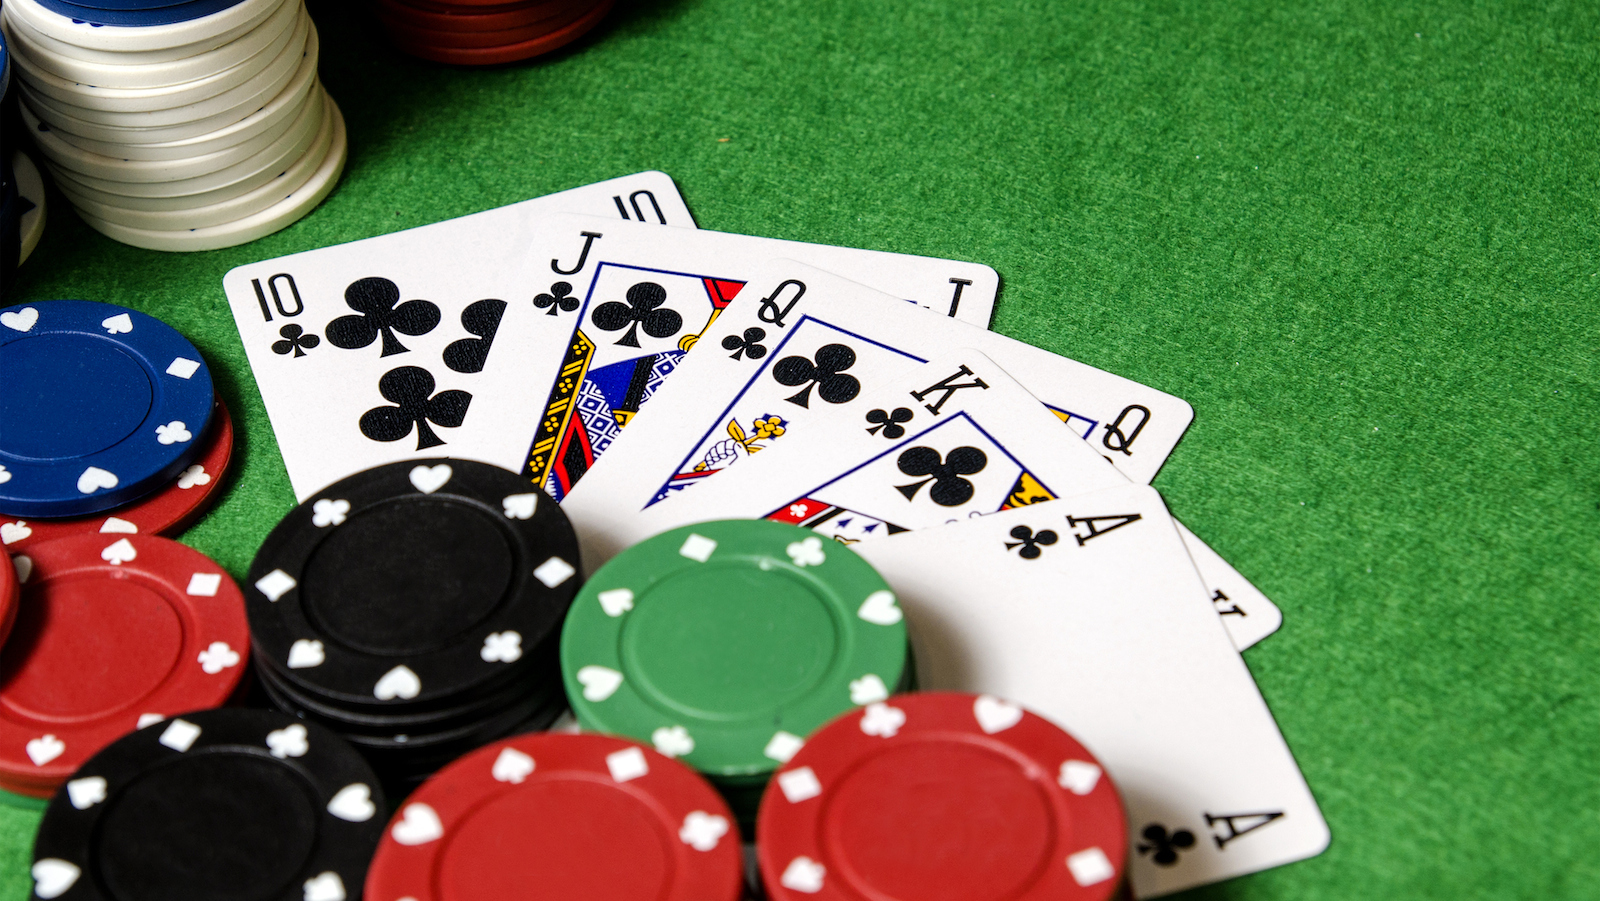 royal flush of sahamrocks between betting chips